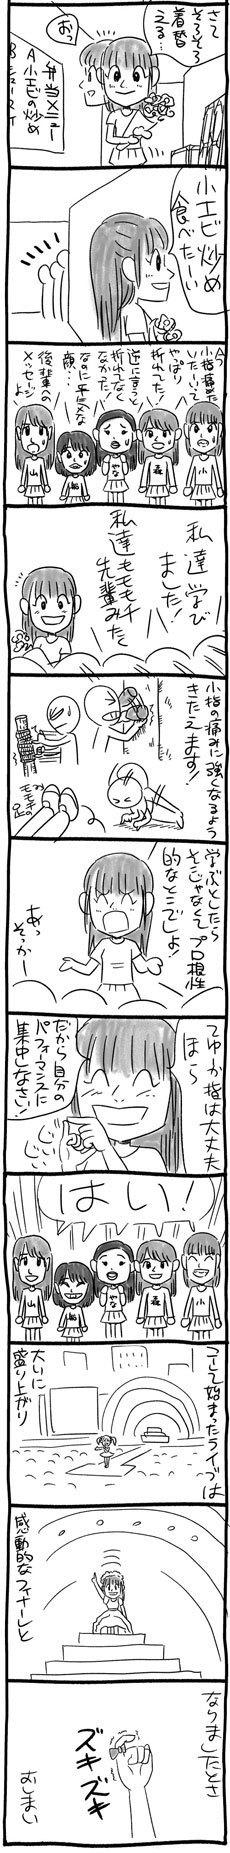 170711momo_mang03.jpg